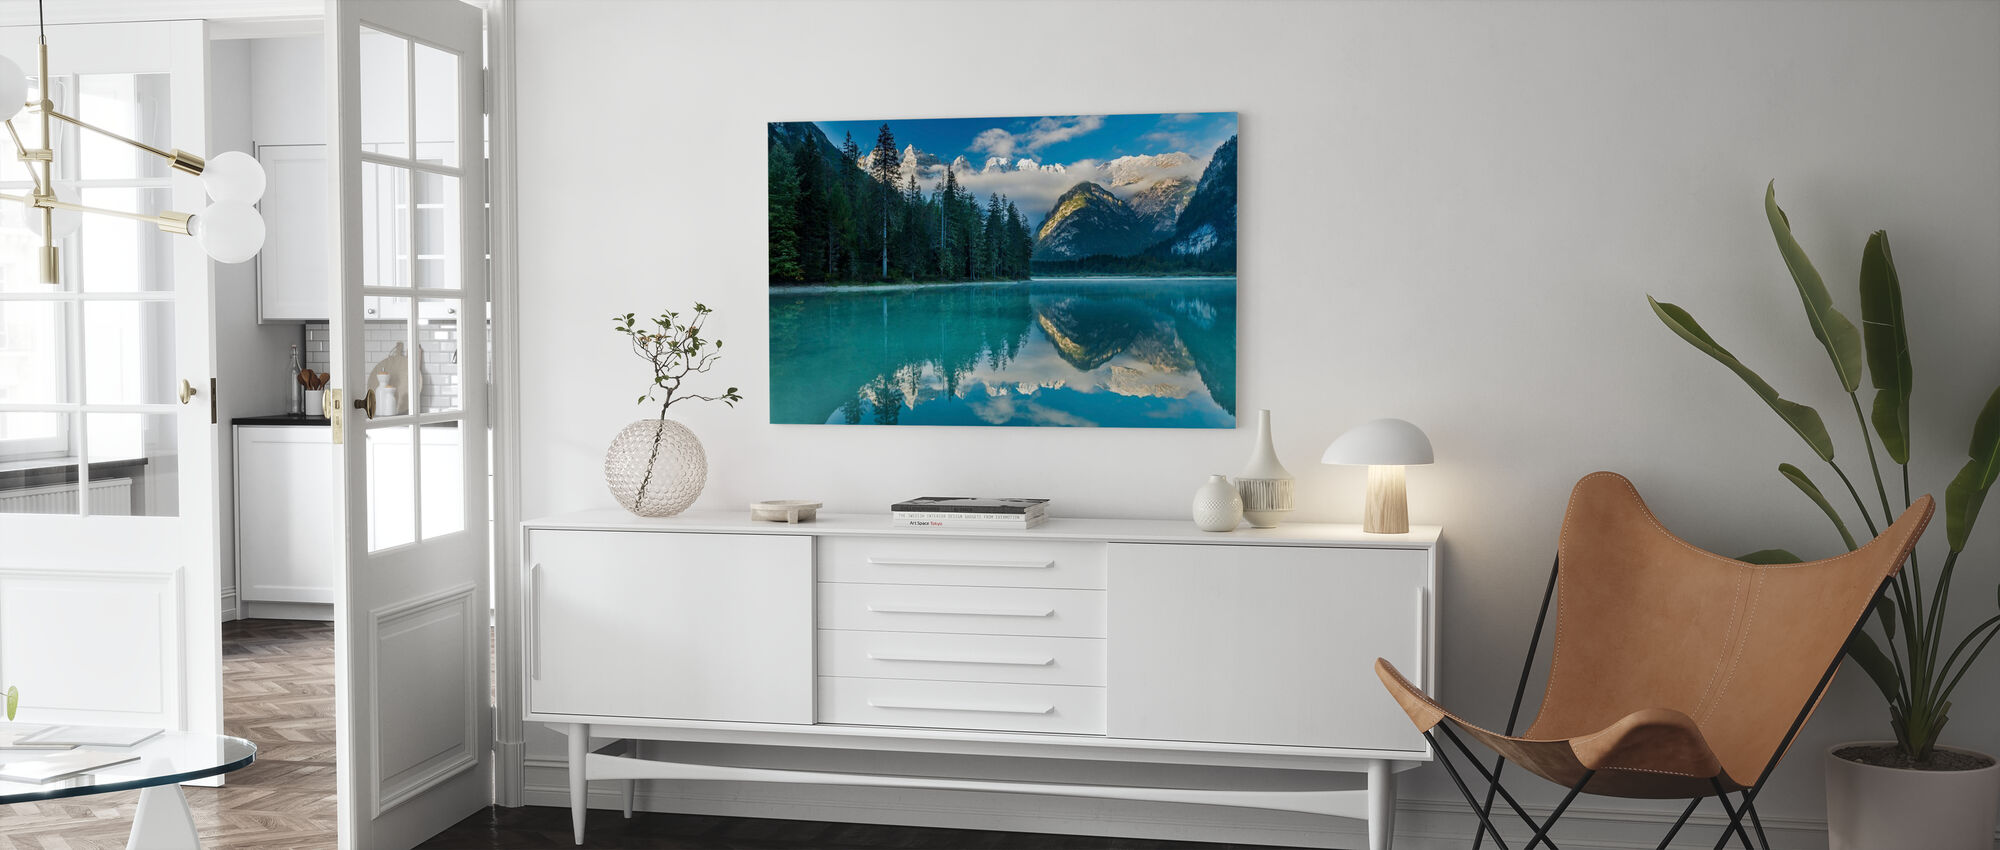 Lake Landro - Canvas print - Living Room